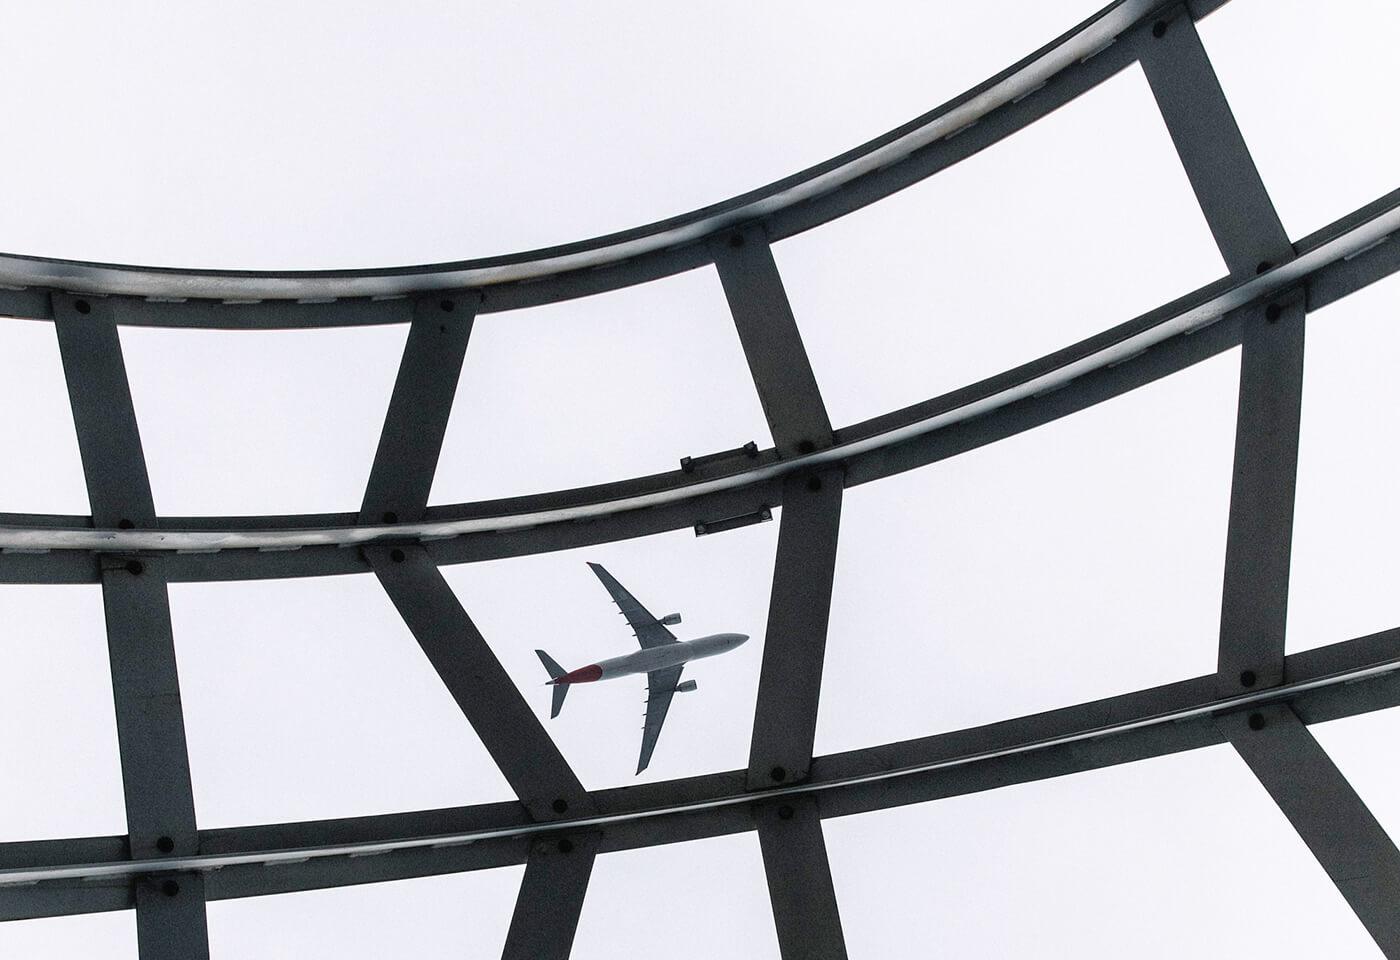 Multiple Exposures Airplane